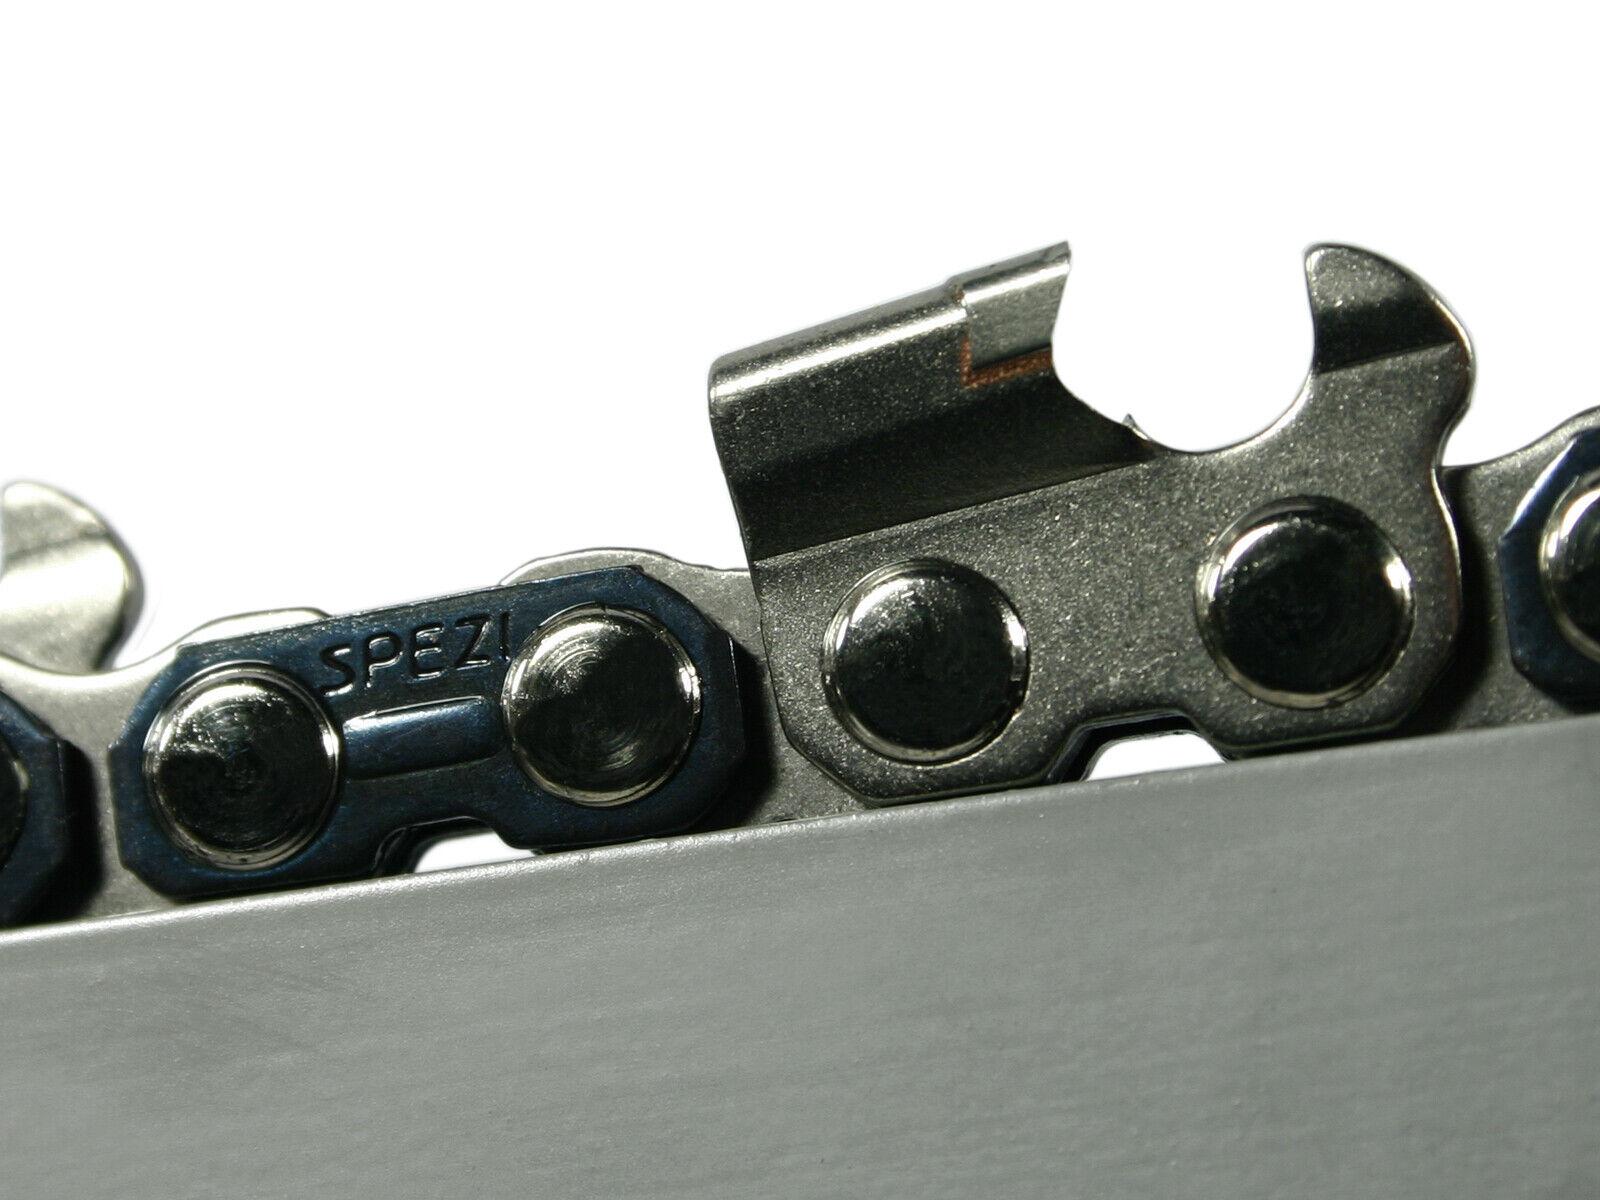 Metal duro cadena sierra adecuado para Husqvarna 351 50 cm 3 8  72 TG 1,5 mm Cochebide